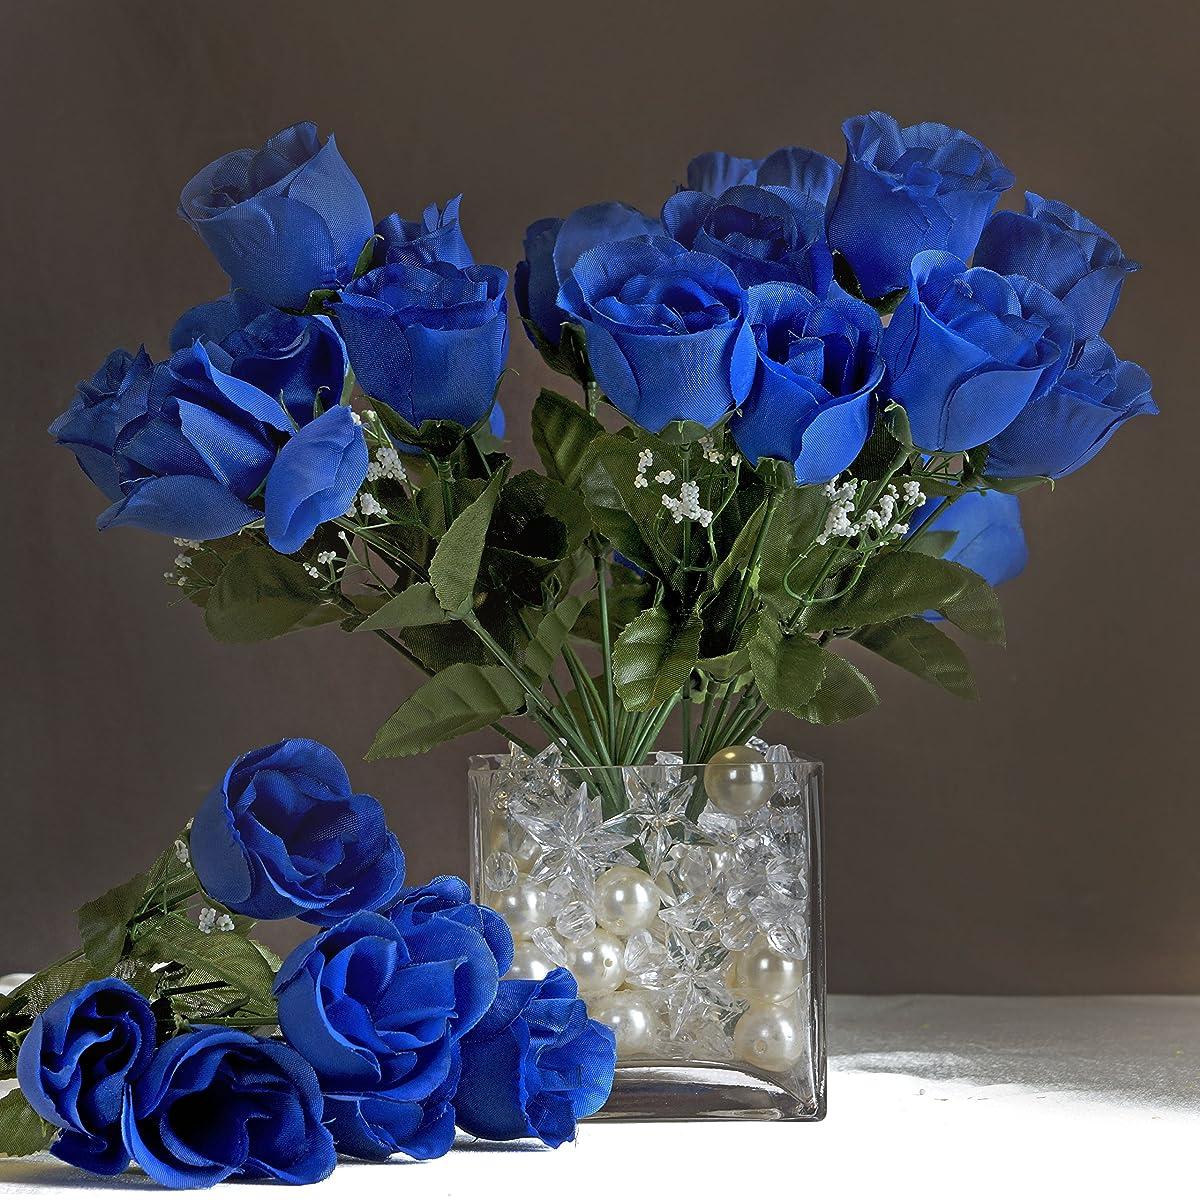 Efavormart 84 Artificial Buds Roses Wedding Flowers Bouquets SALE - Royal Blue